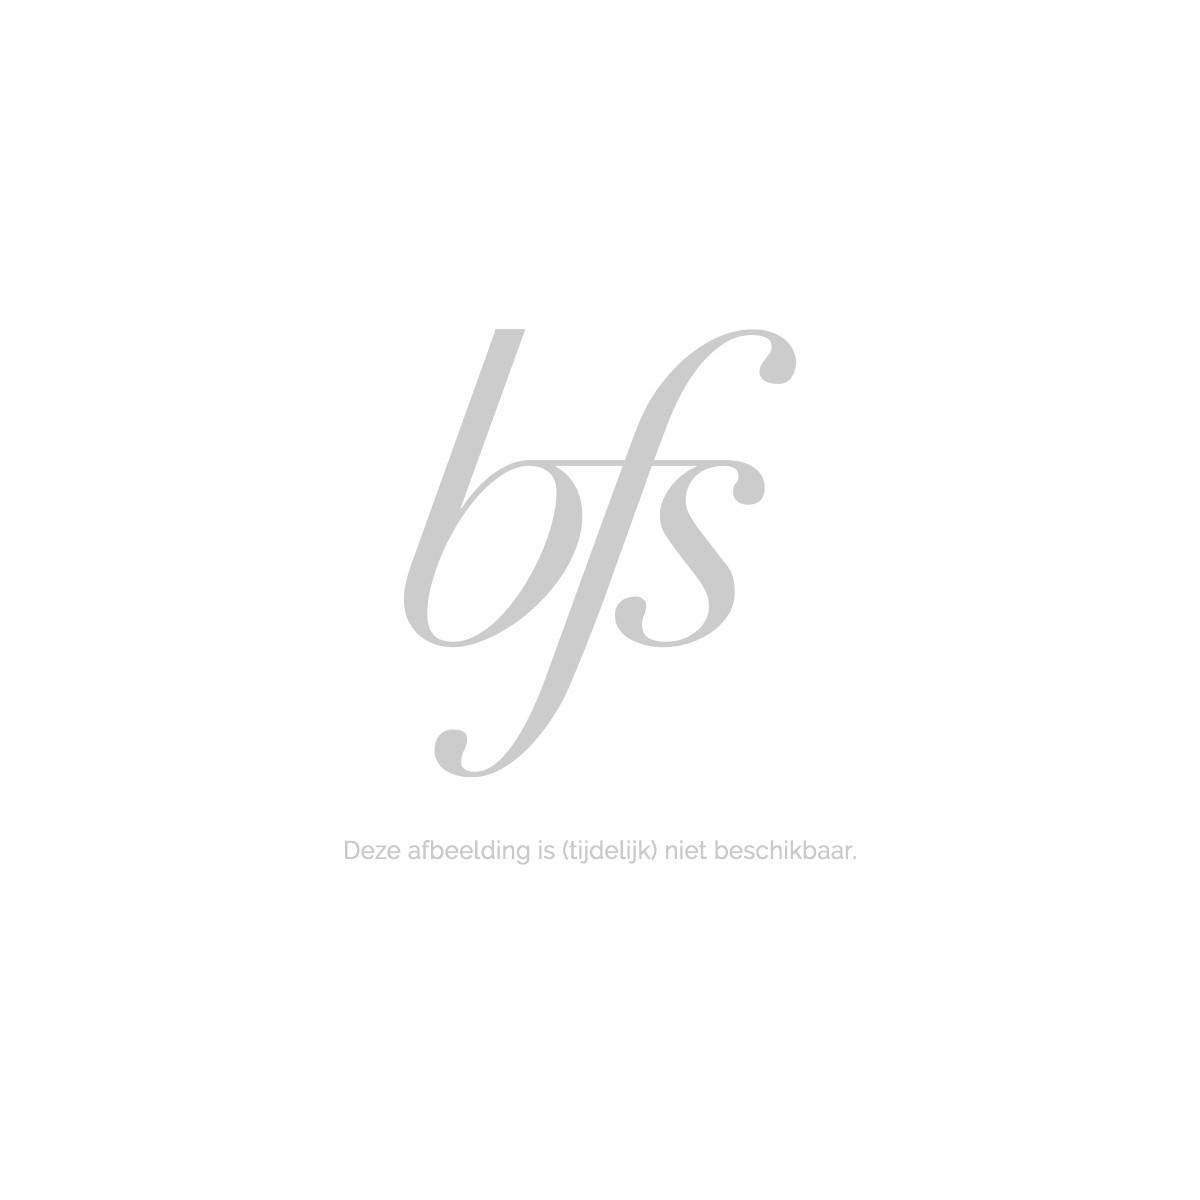 Bourjois Mascara Volume 1 Seconde